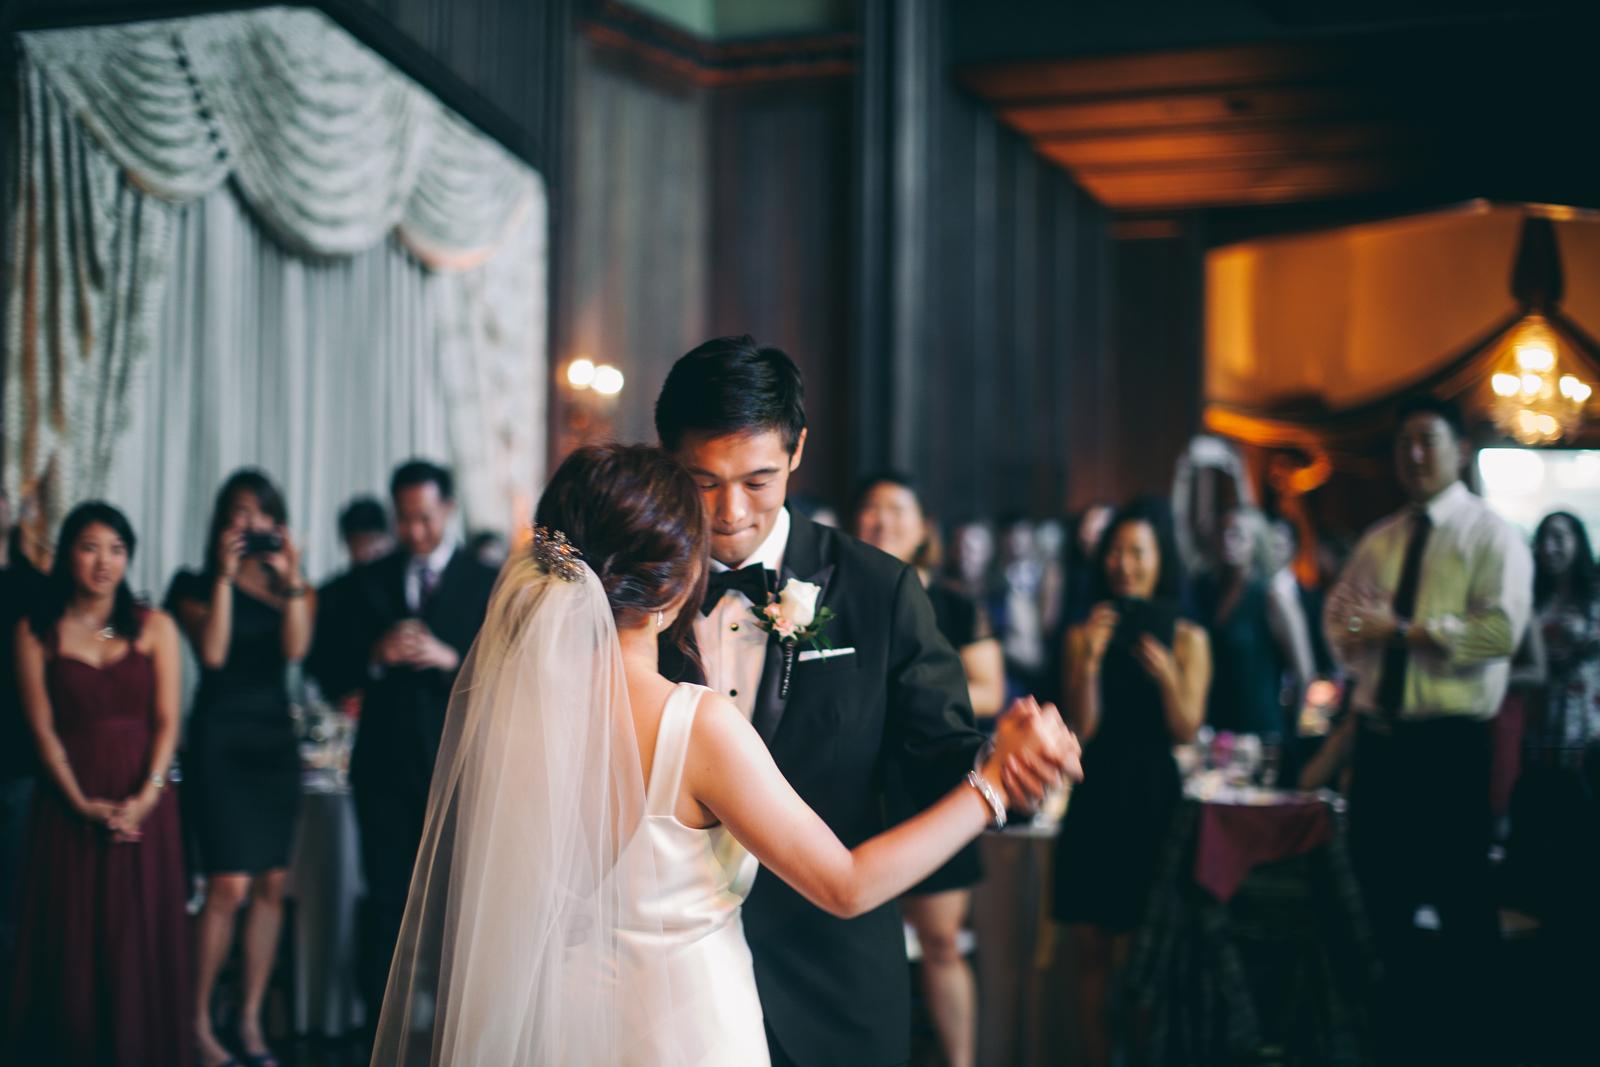 kohl_manison_wedding_photography_sarah_eric_ebony_siovhan_bokeh_photography_081.jpg